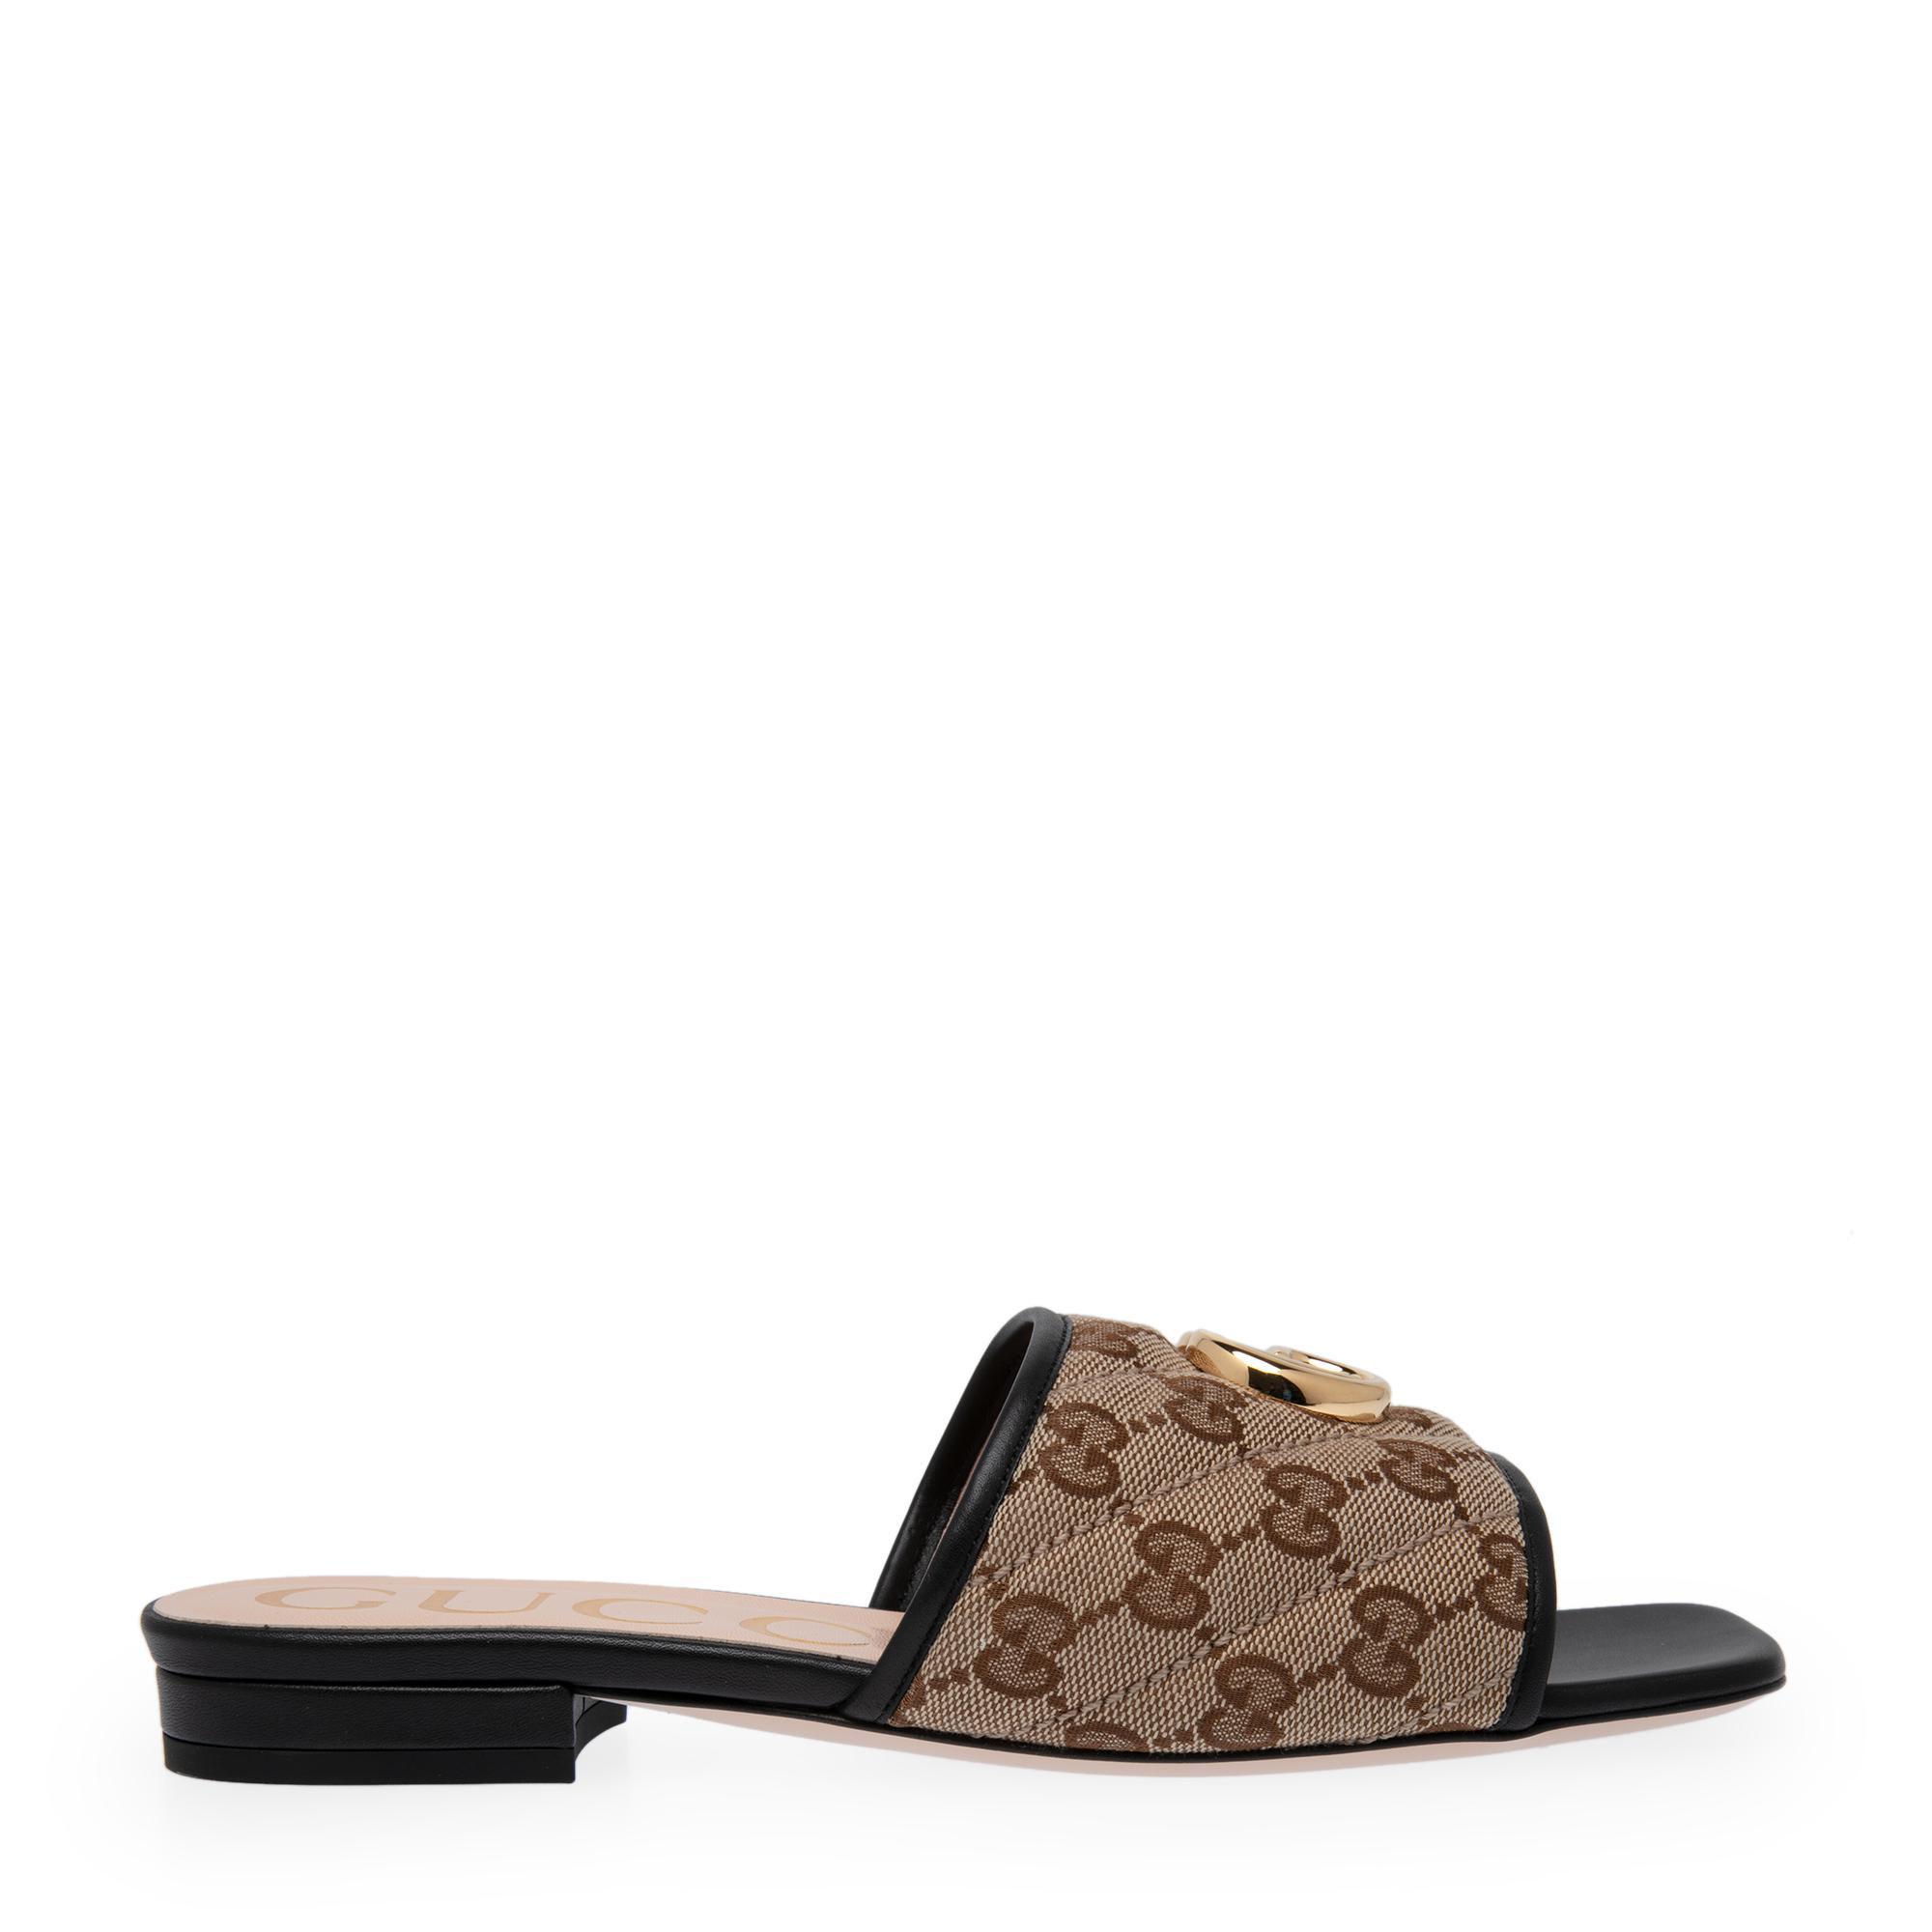 GG matelassé canvas flat sandals